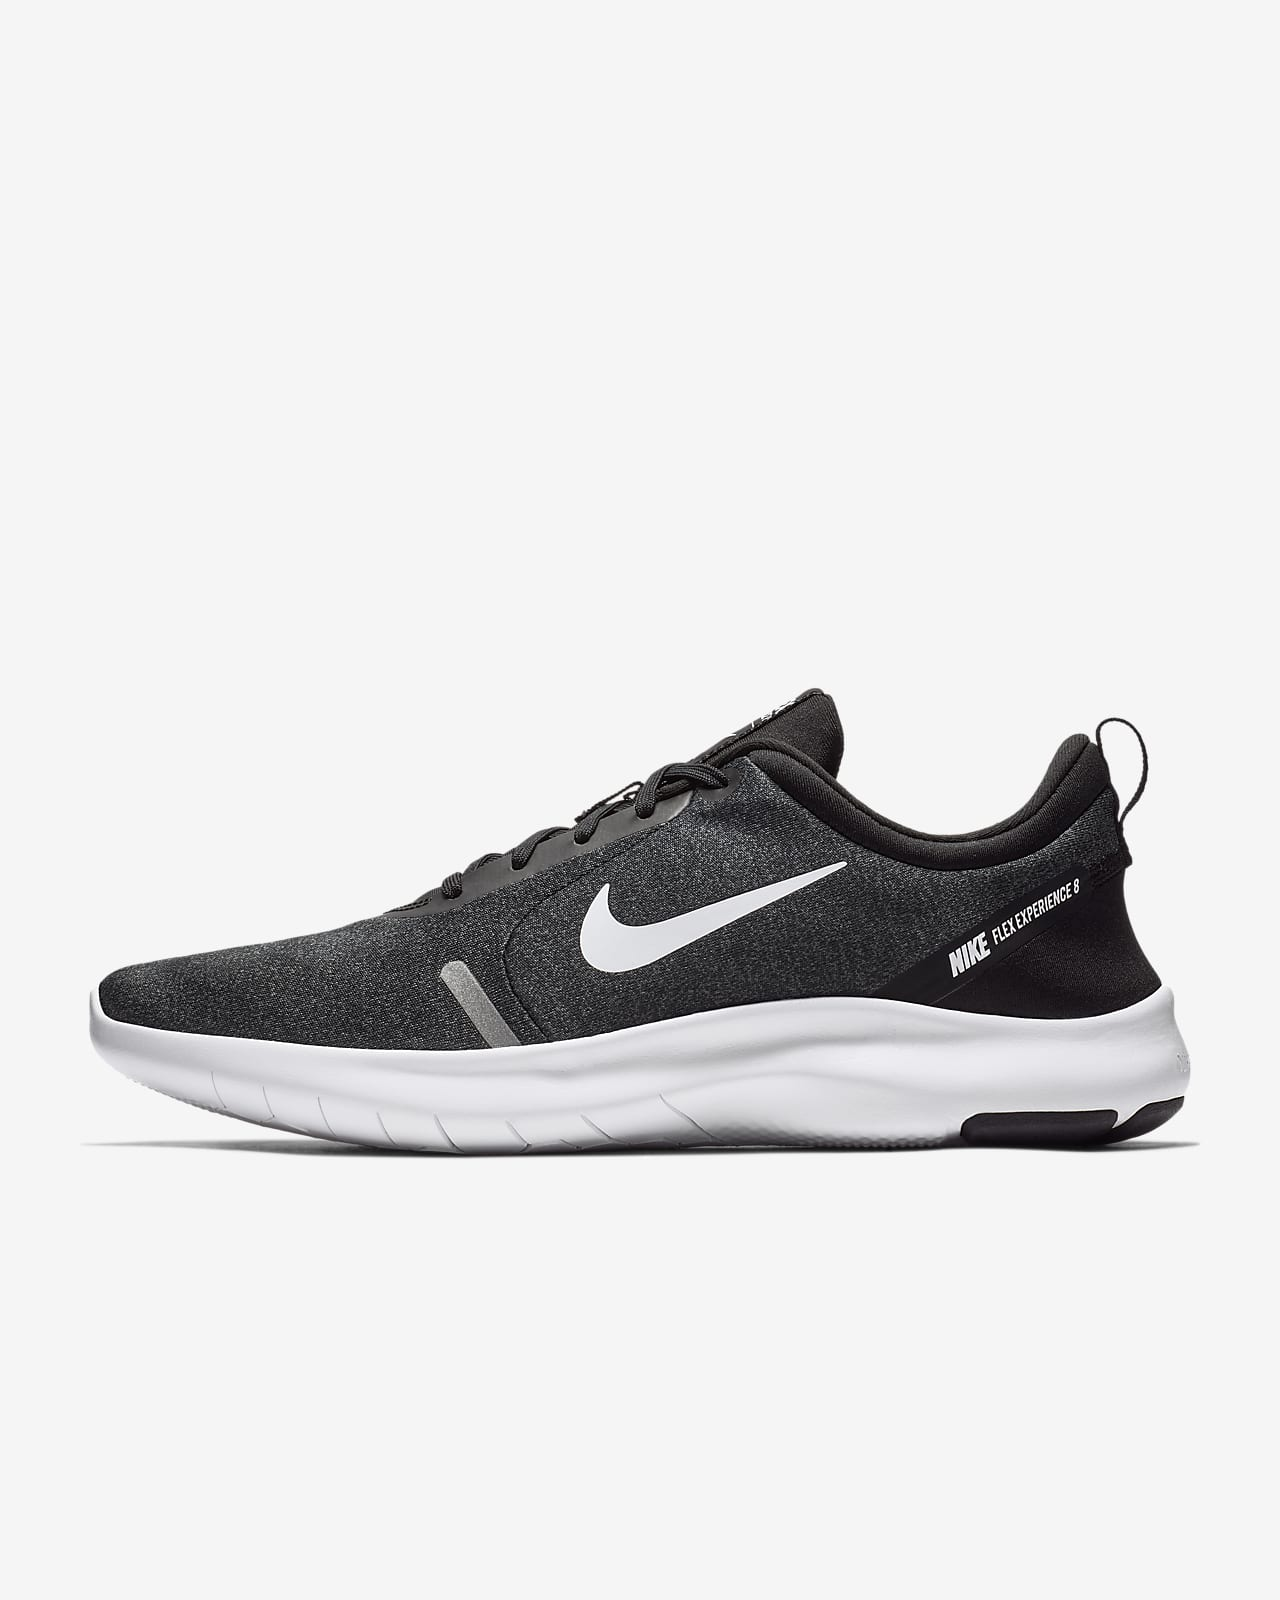 Nike Flex Experience RN 8 Black//White-Cool Grey Sportstyle Running AJ5900-013